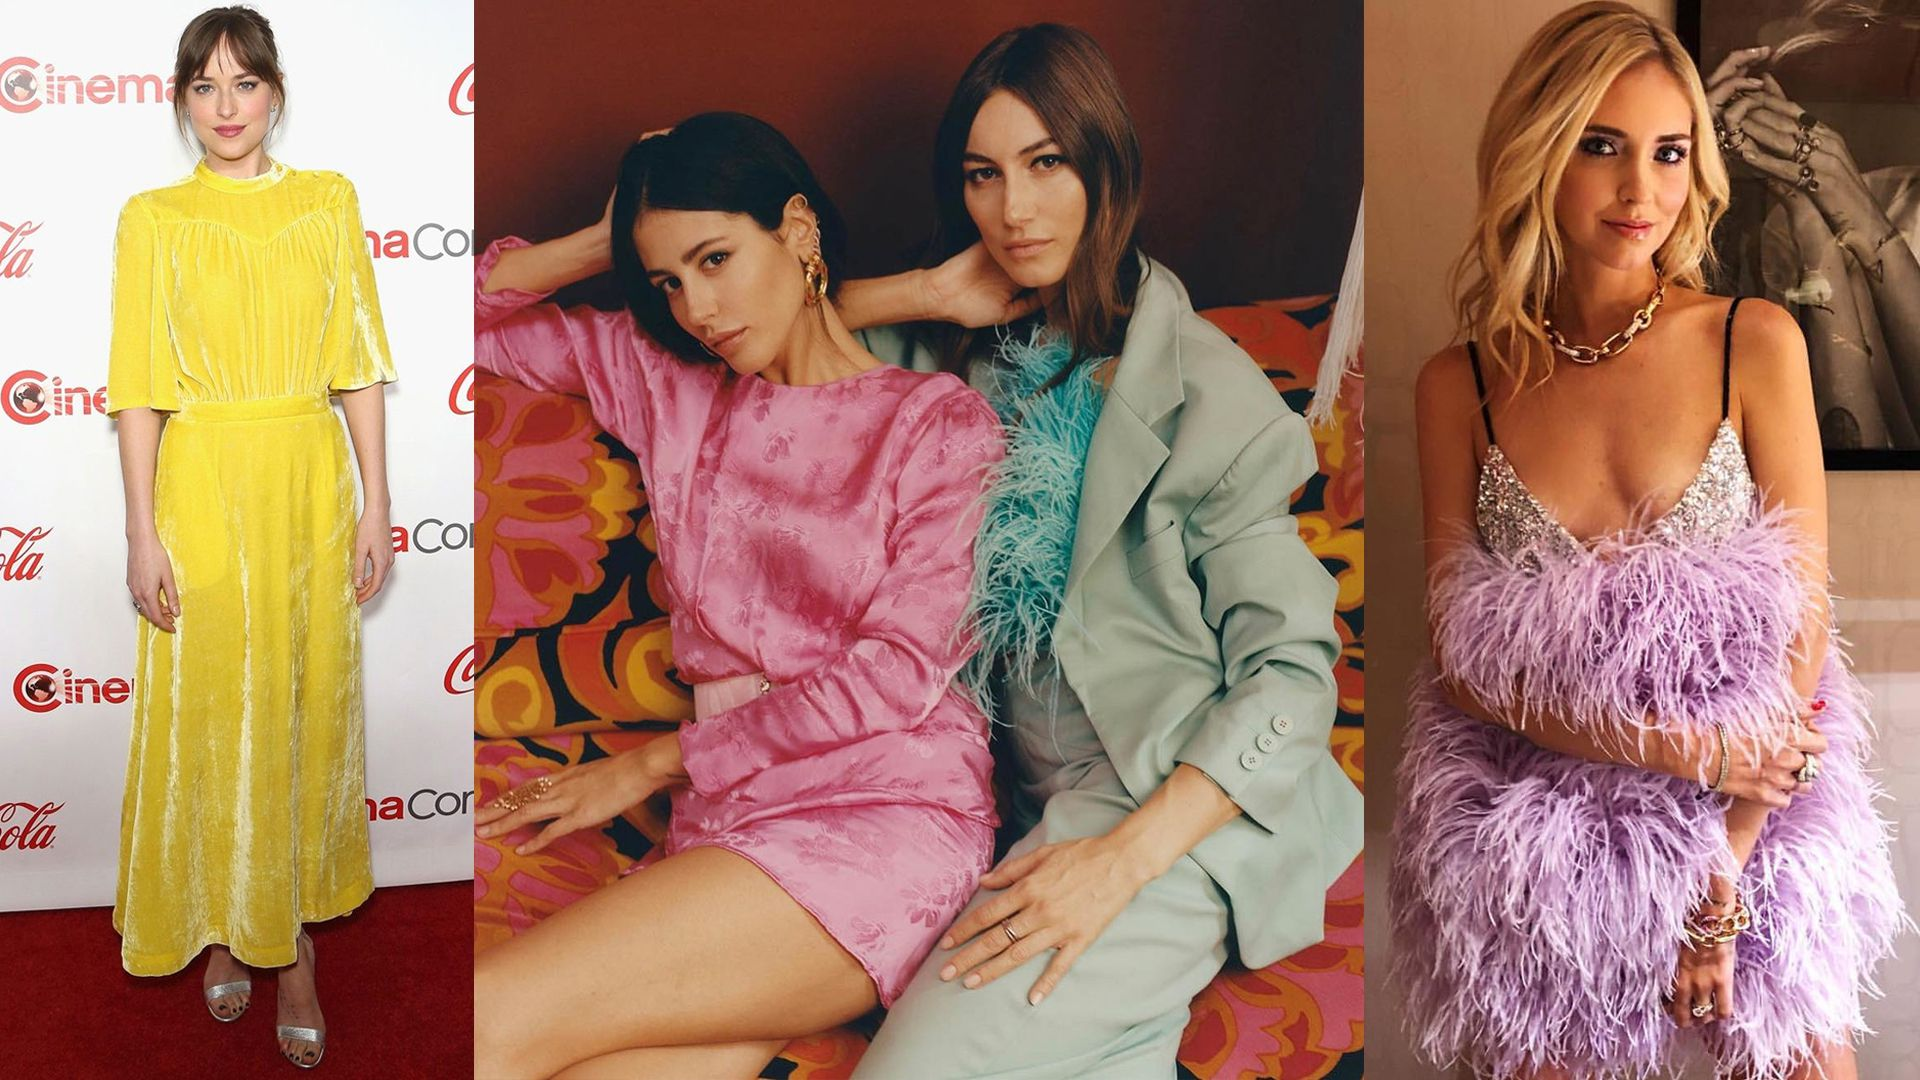 Giorgia Tordini y Gilda Ambrosio están al frente de The Attico, la marca que viste a varias celebrities. Dakota Johnson y Chiara Ferragni son fans.